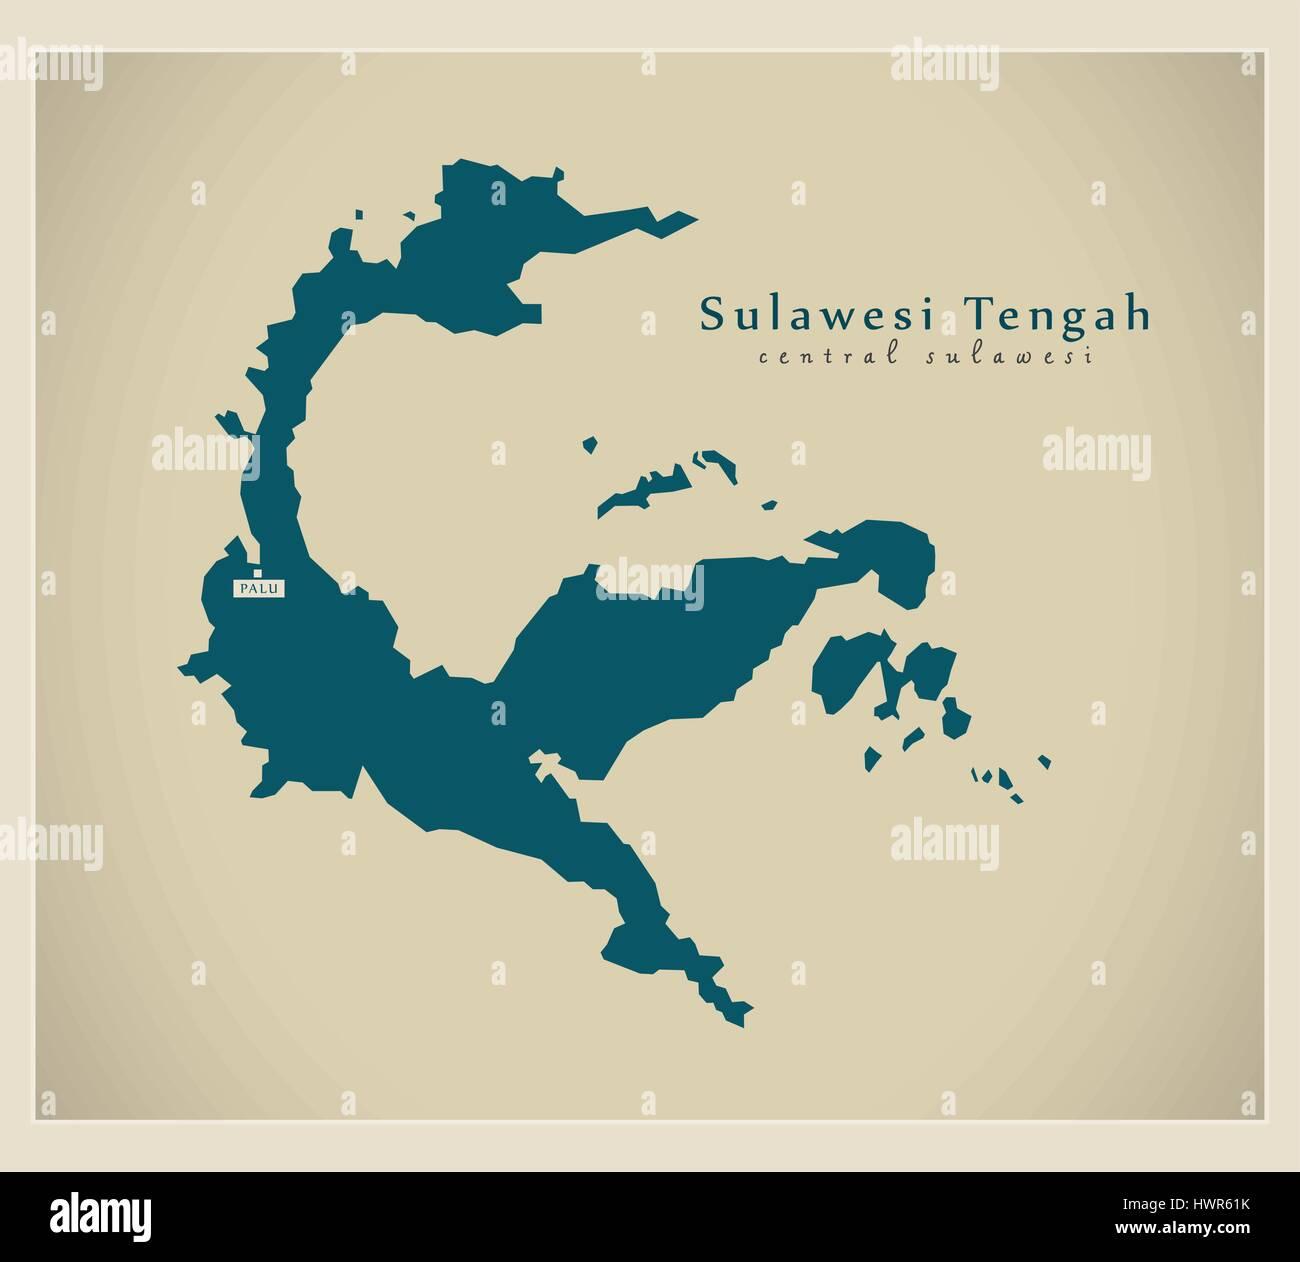 Modern Map - Sulawesi Tengah ID - Stock Vector